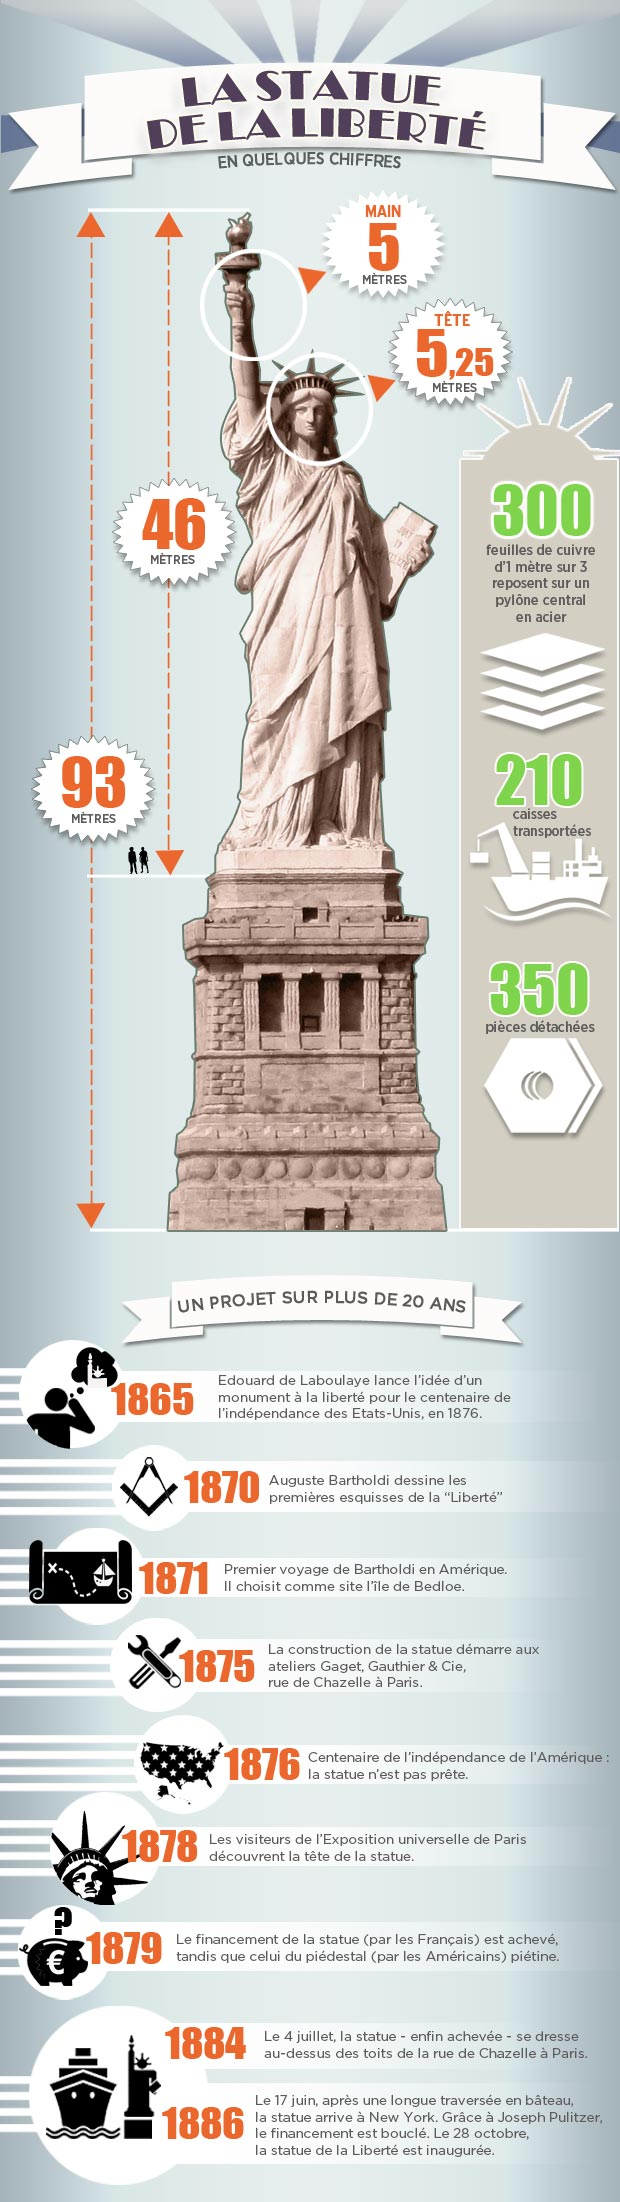 statue_liberte_FR